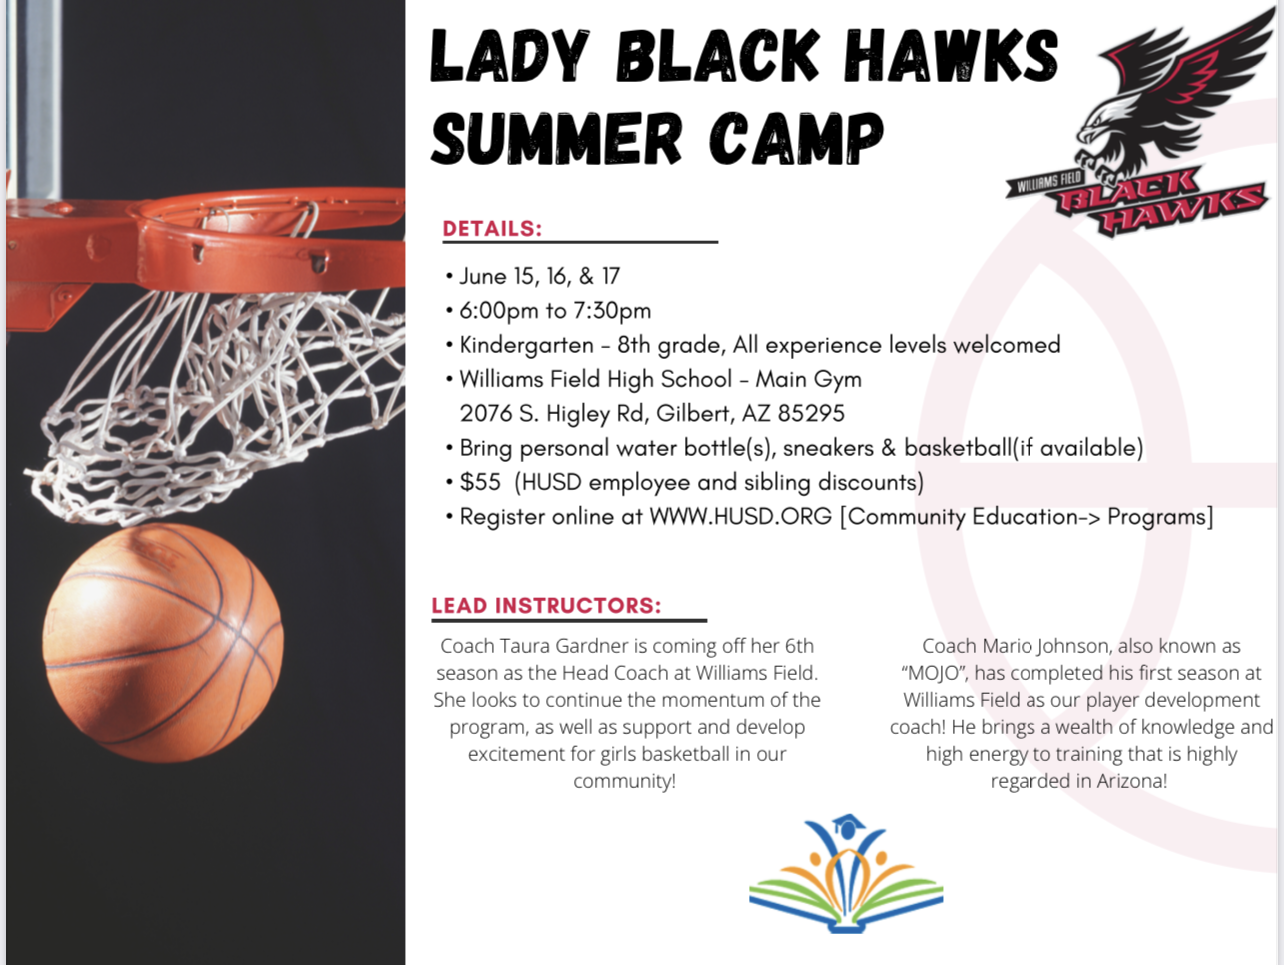 LADY BLACK HAWKS SUMMER BASKETBALL CAMP….WE'RE BACK!